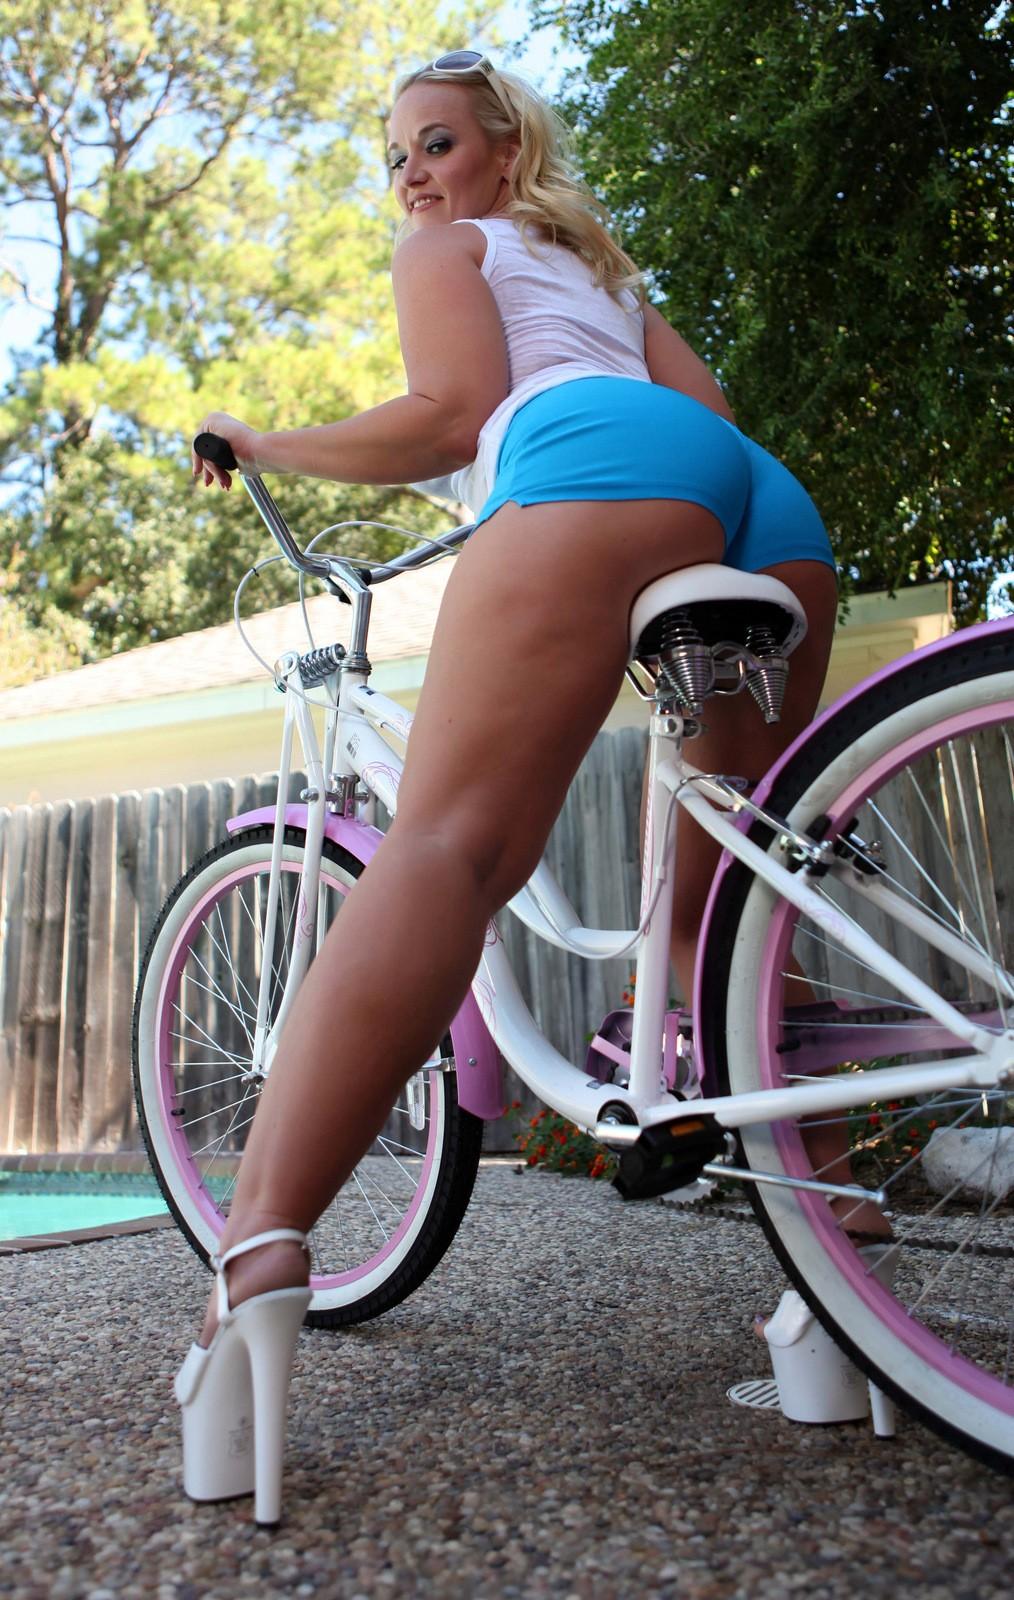 from Raiden hot naked ass in a bike